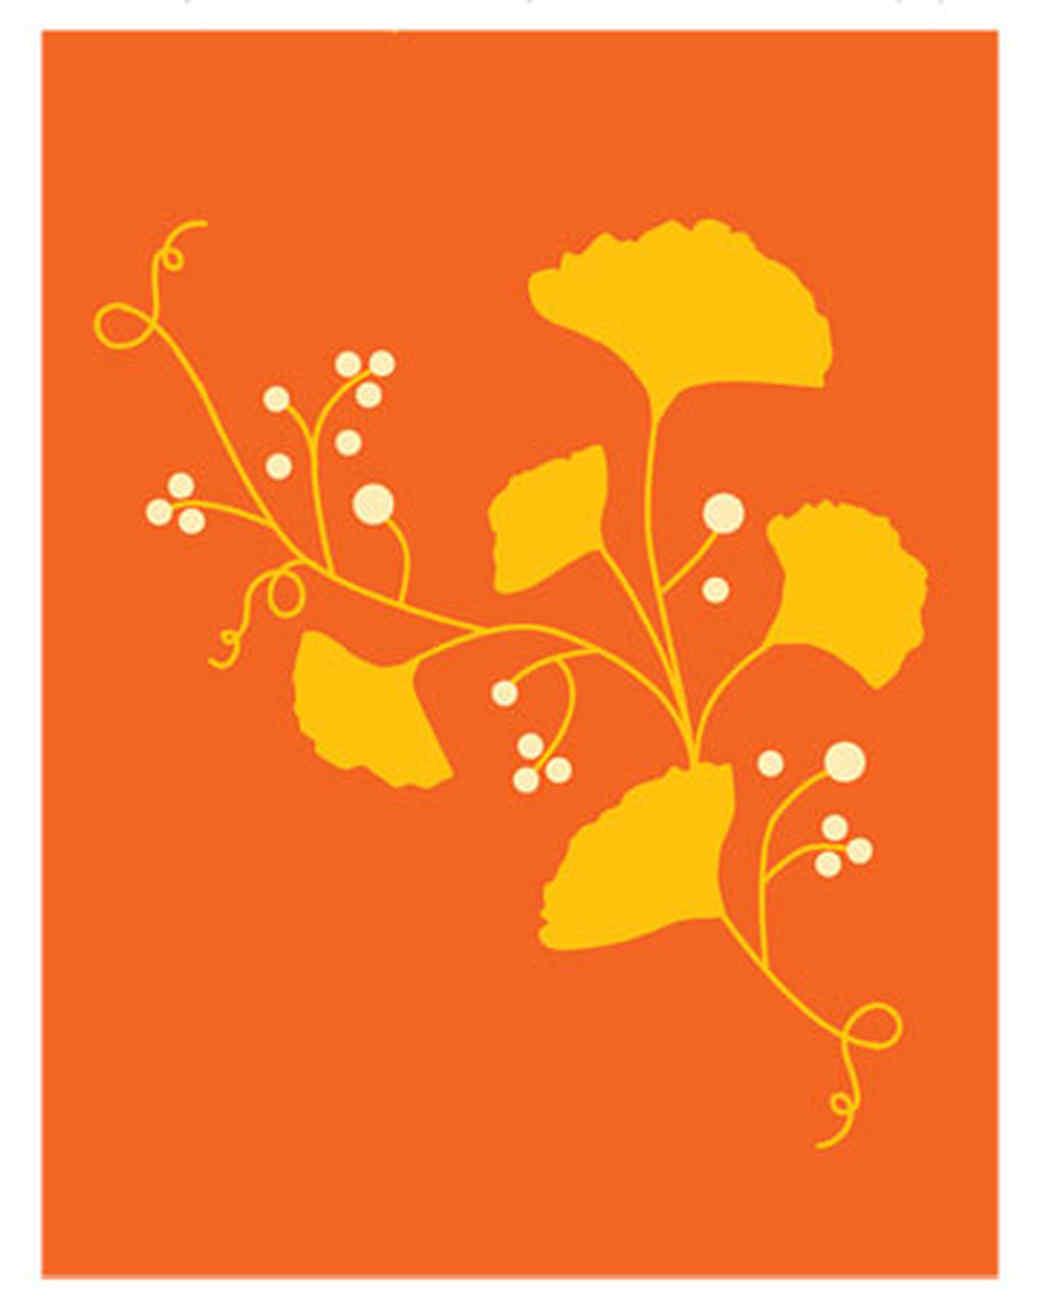 msl_1010_pumpkin_carving_templates_11_image.jpg